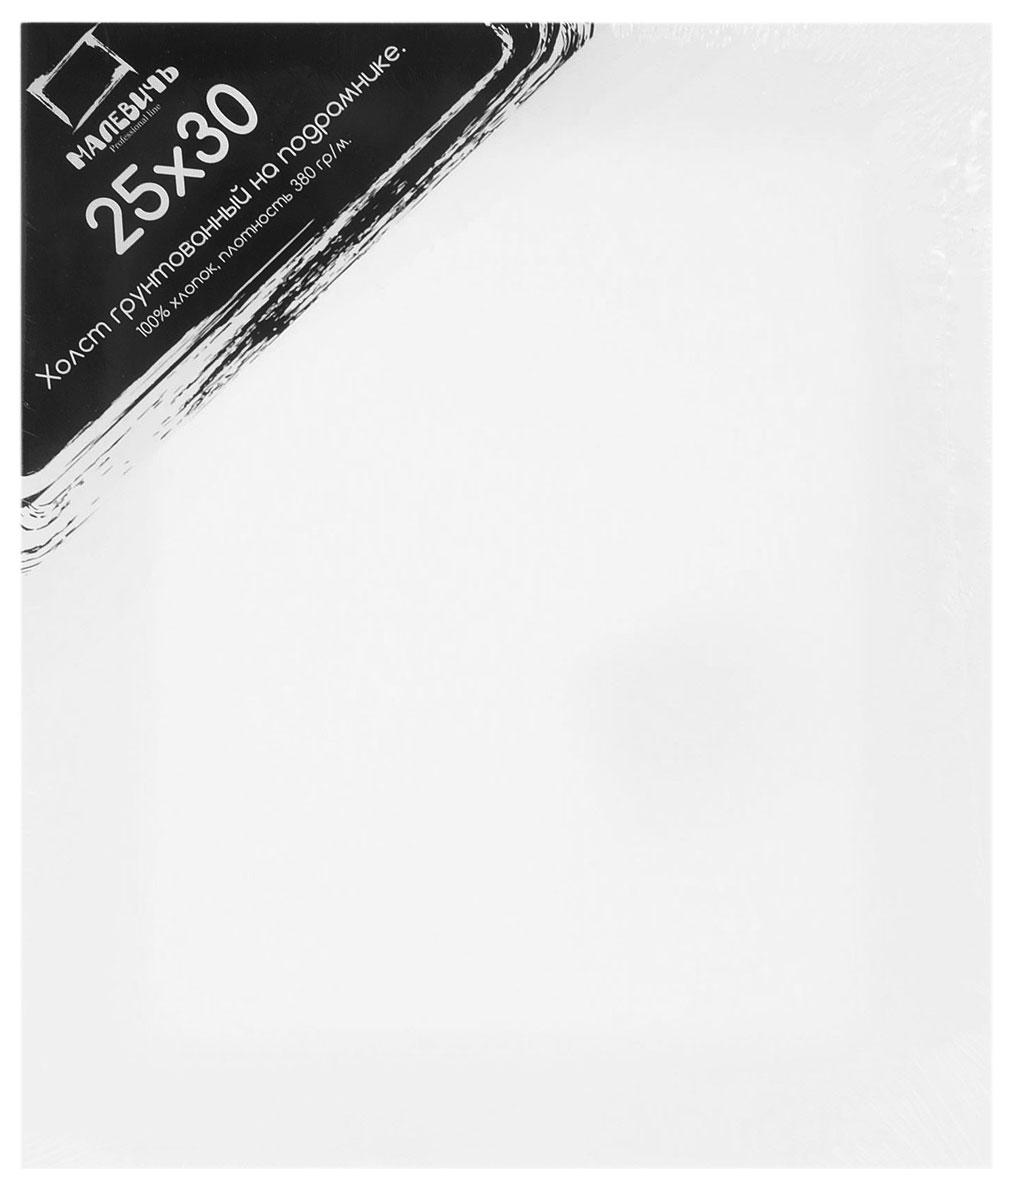 Малевичъ Холст на подрамнике 25 см x 30 см 380 г/м2